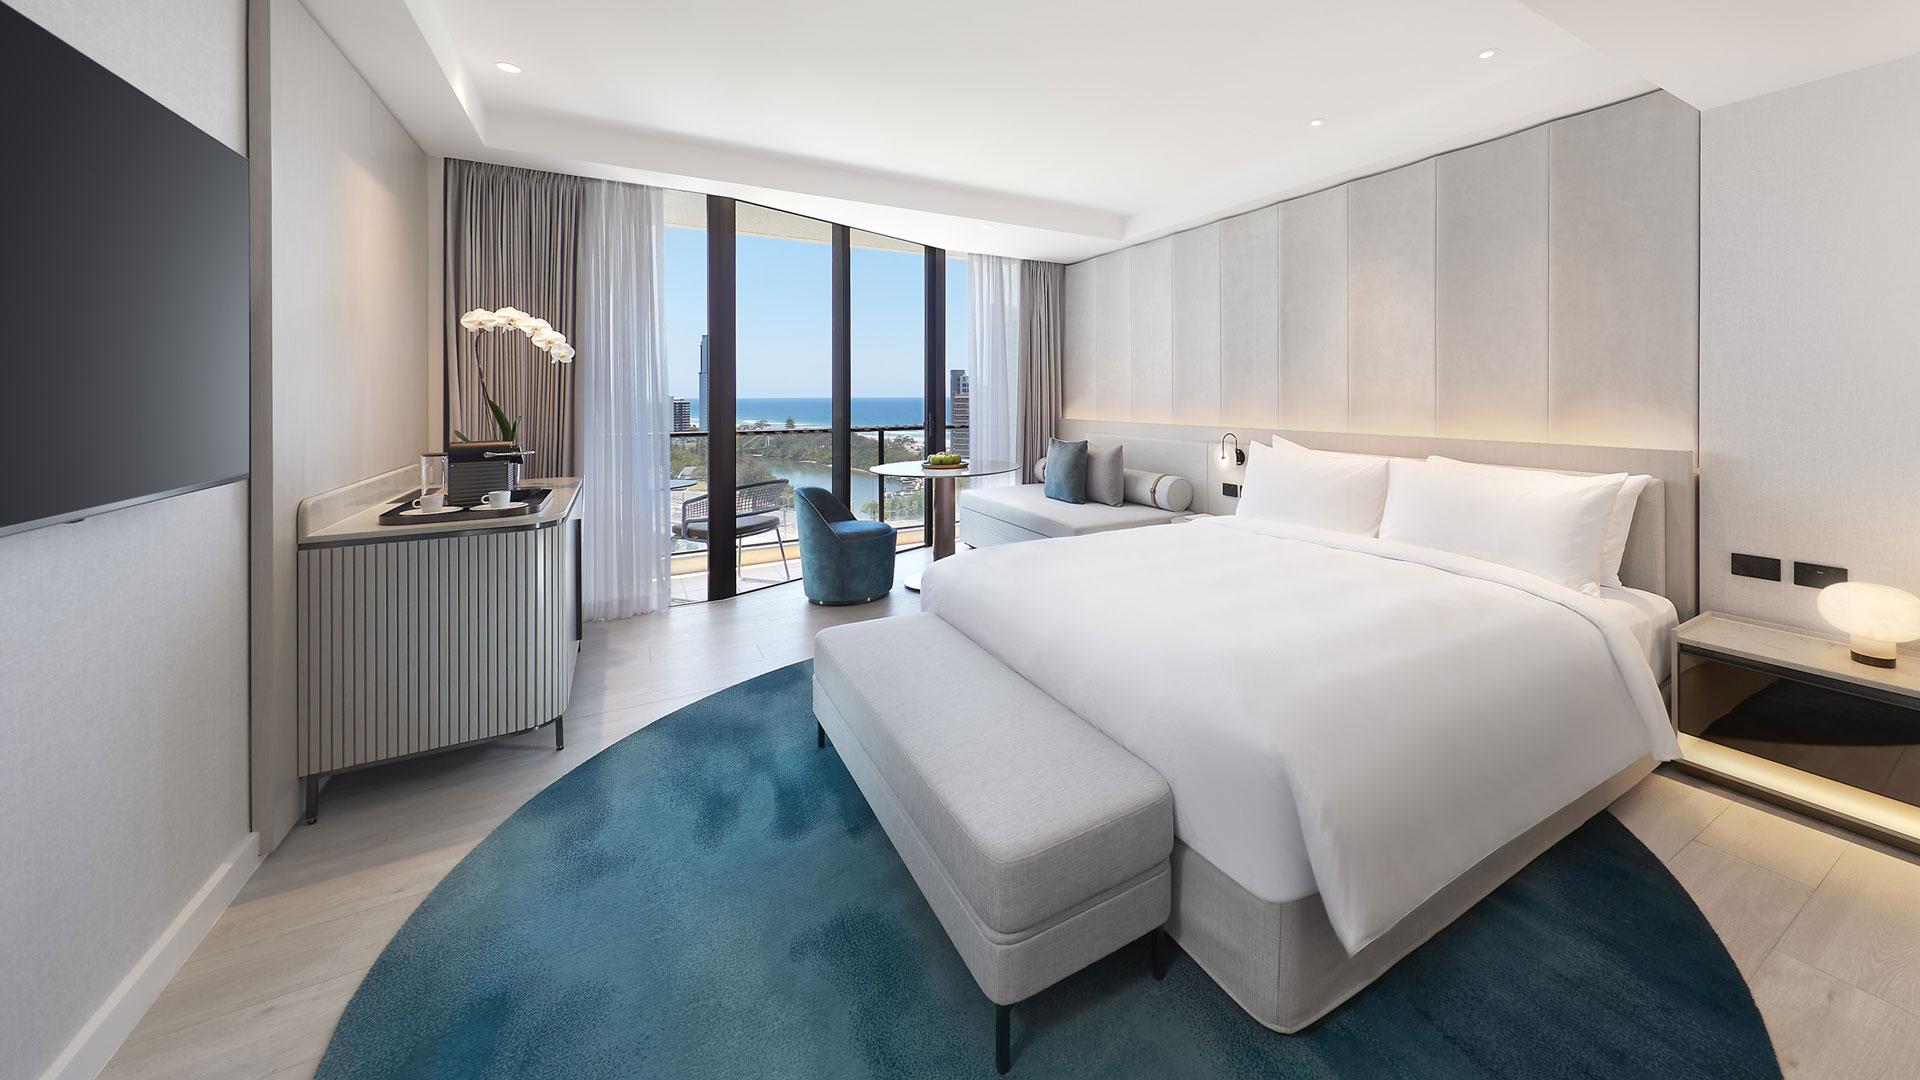 JW Marriott King Ocean Room